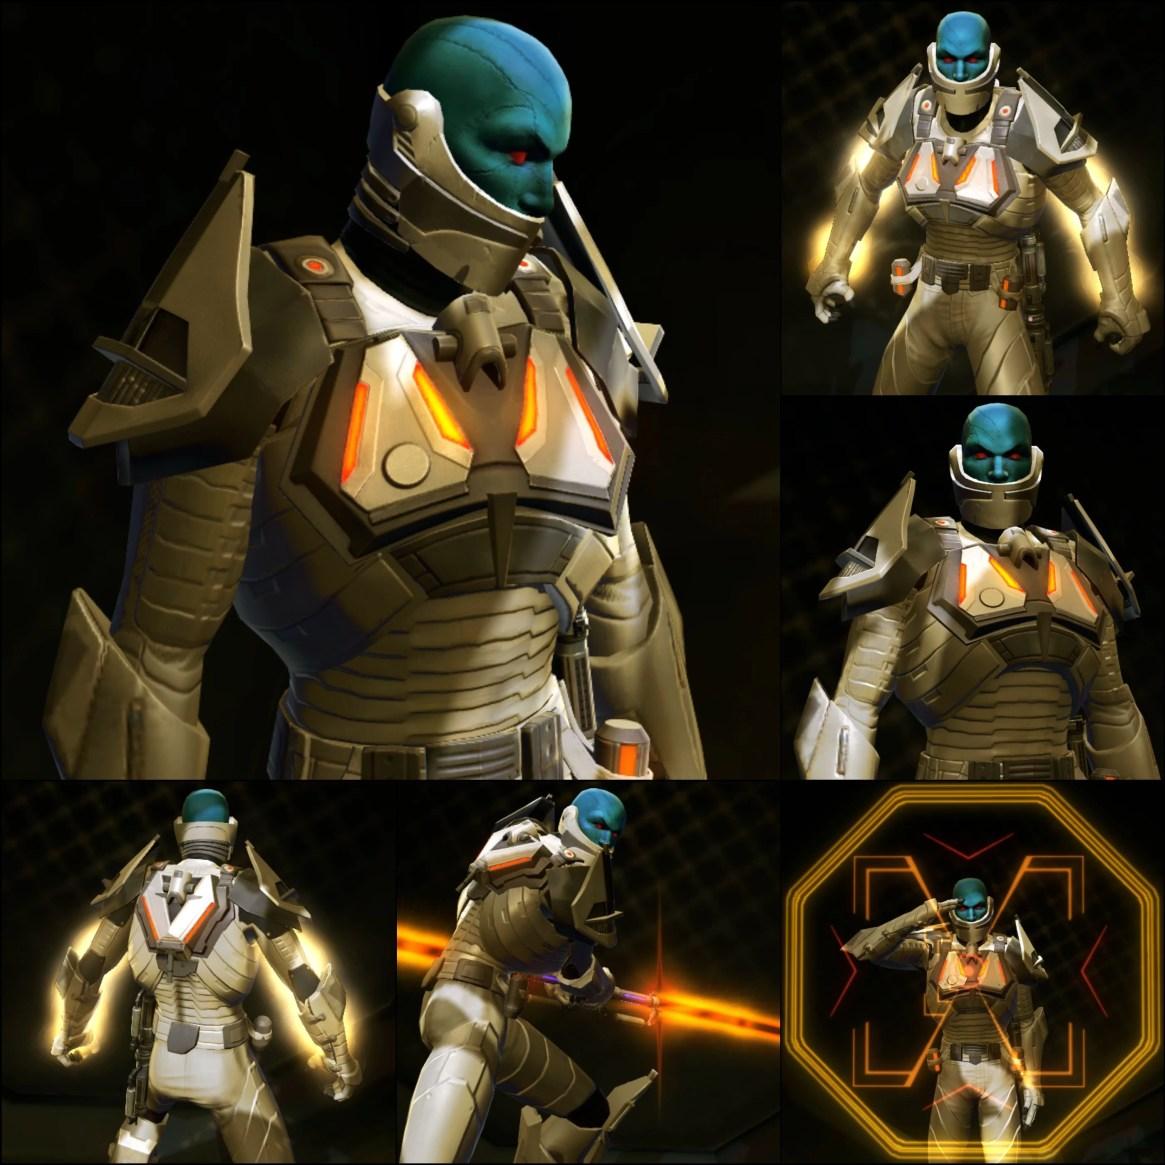 Aeden-Fear-Har-Collage-7